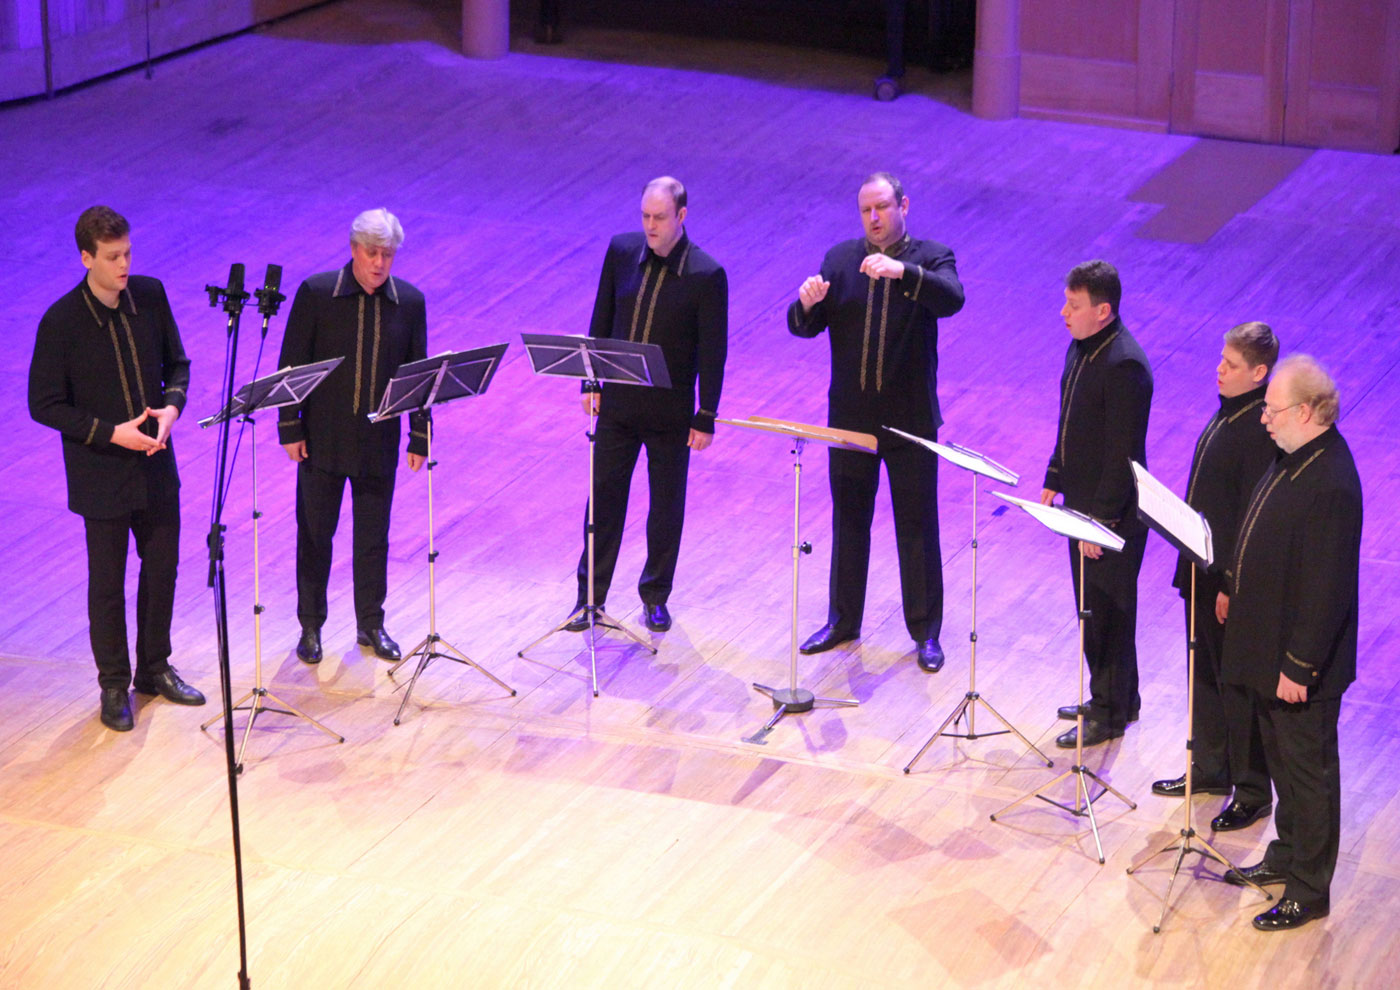 Optina Pustyn male choir